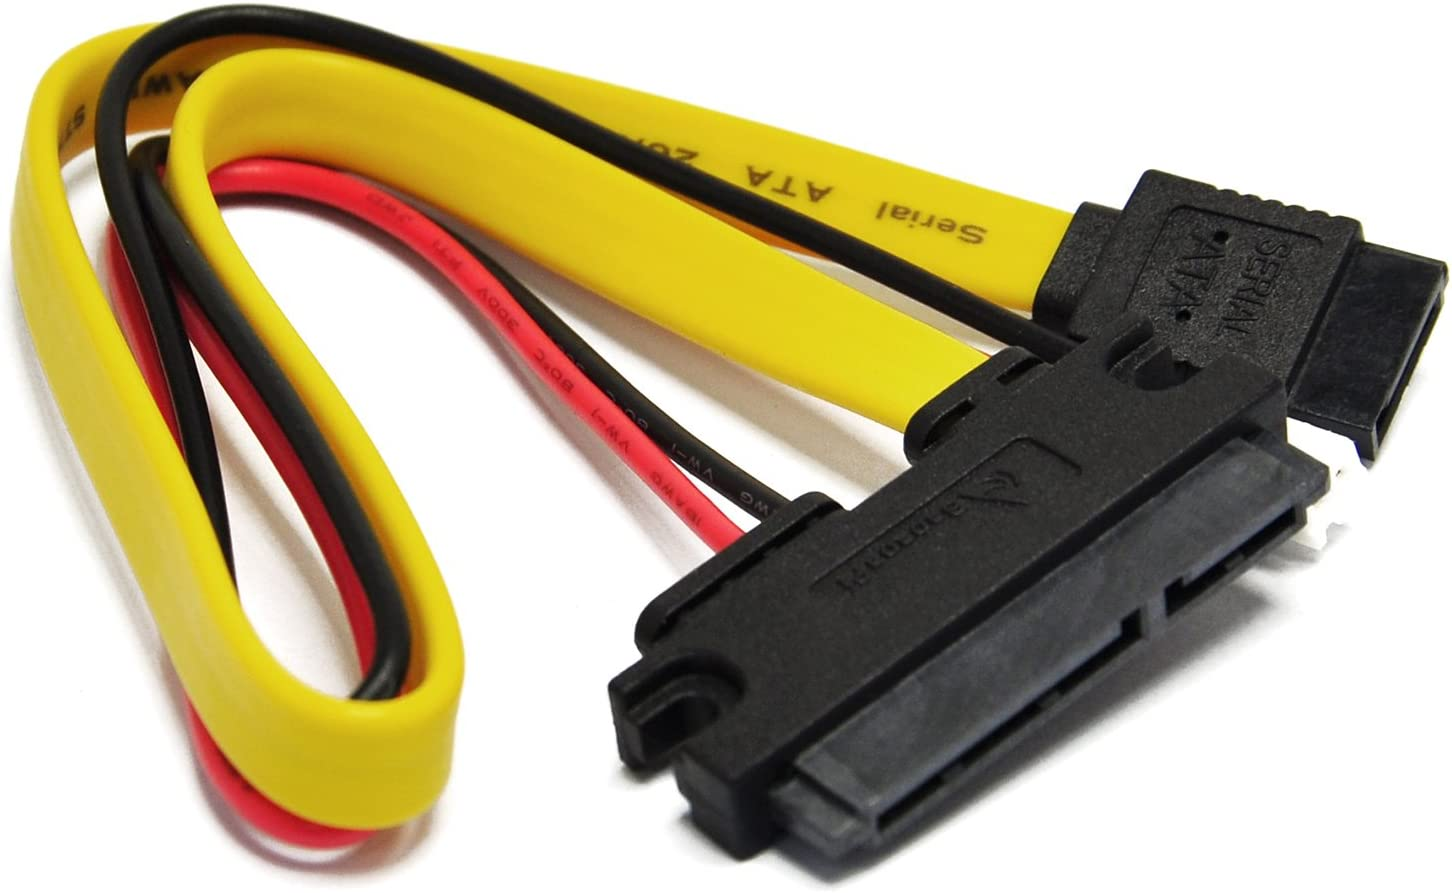 Gikfun Sata Cable HDD Connectors with Power Supply Port for Banana PI EK1613